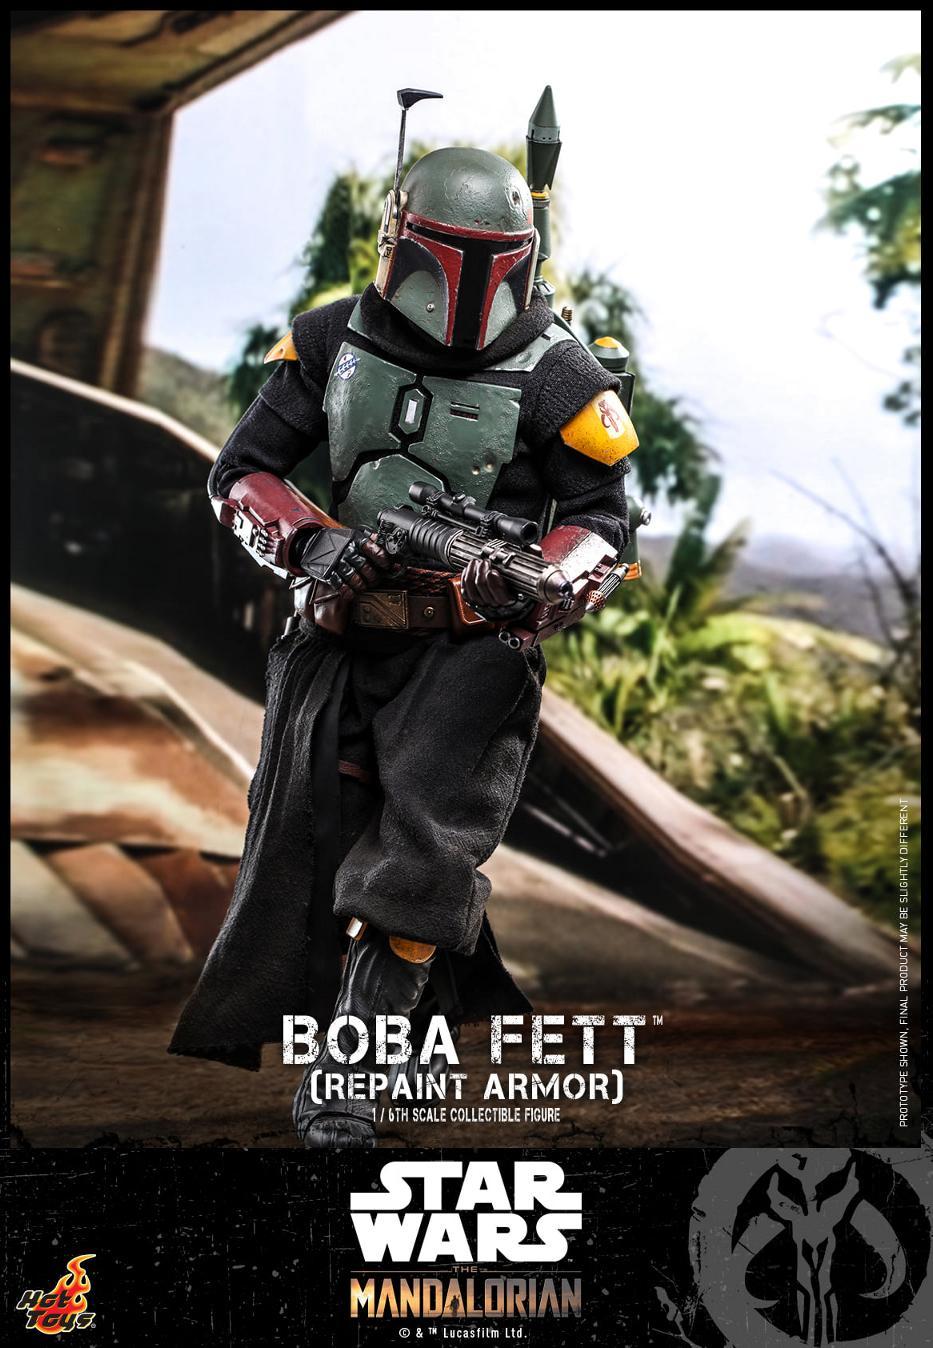 Boba Fett (Repaint Armor) Collectible Figure - Hot Toys Boba_f67